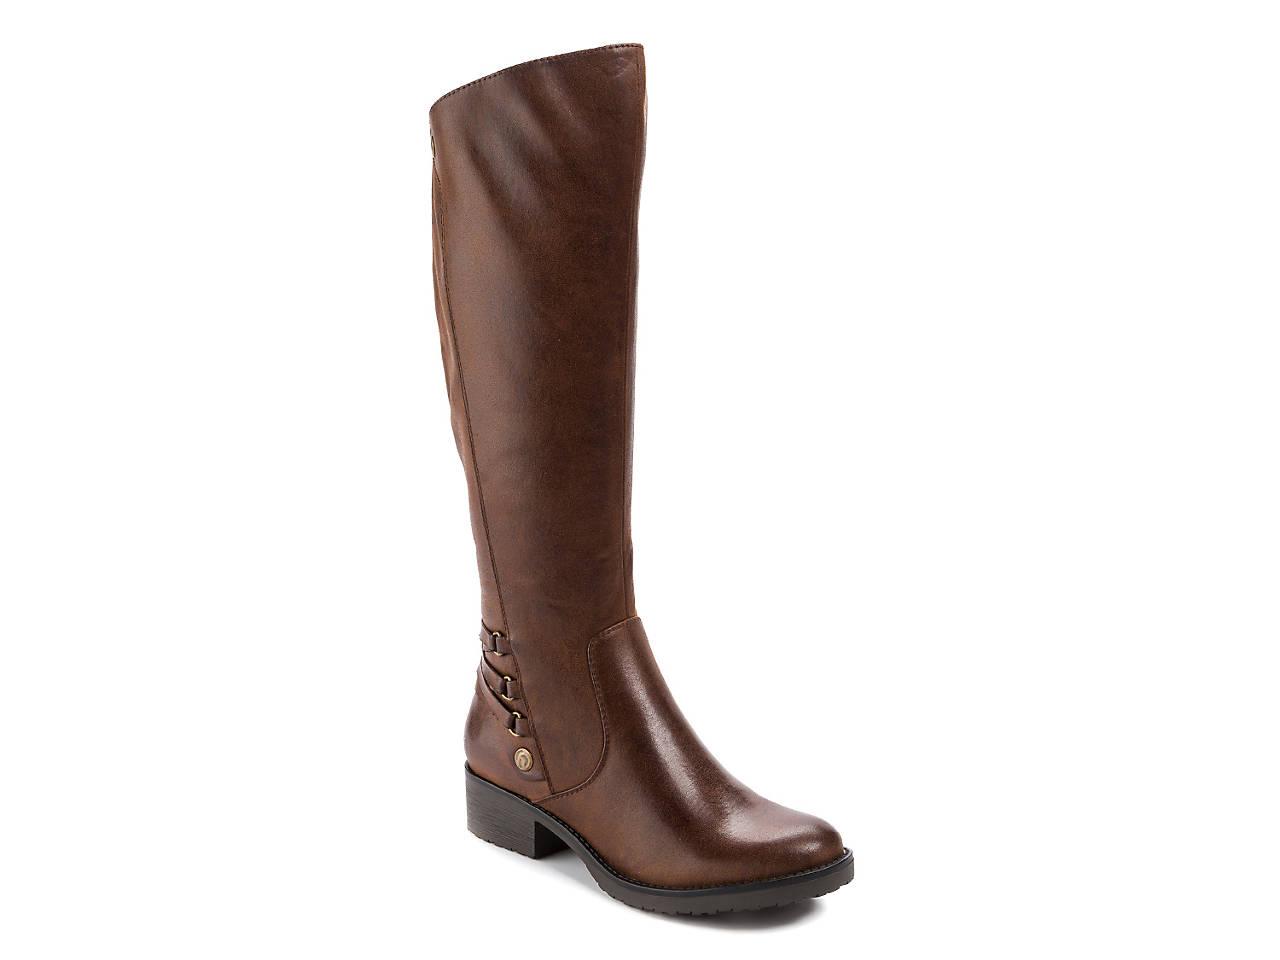 c4a20f2aa1f Bare Traps Ornella Riding Boot Women s Shoes